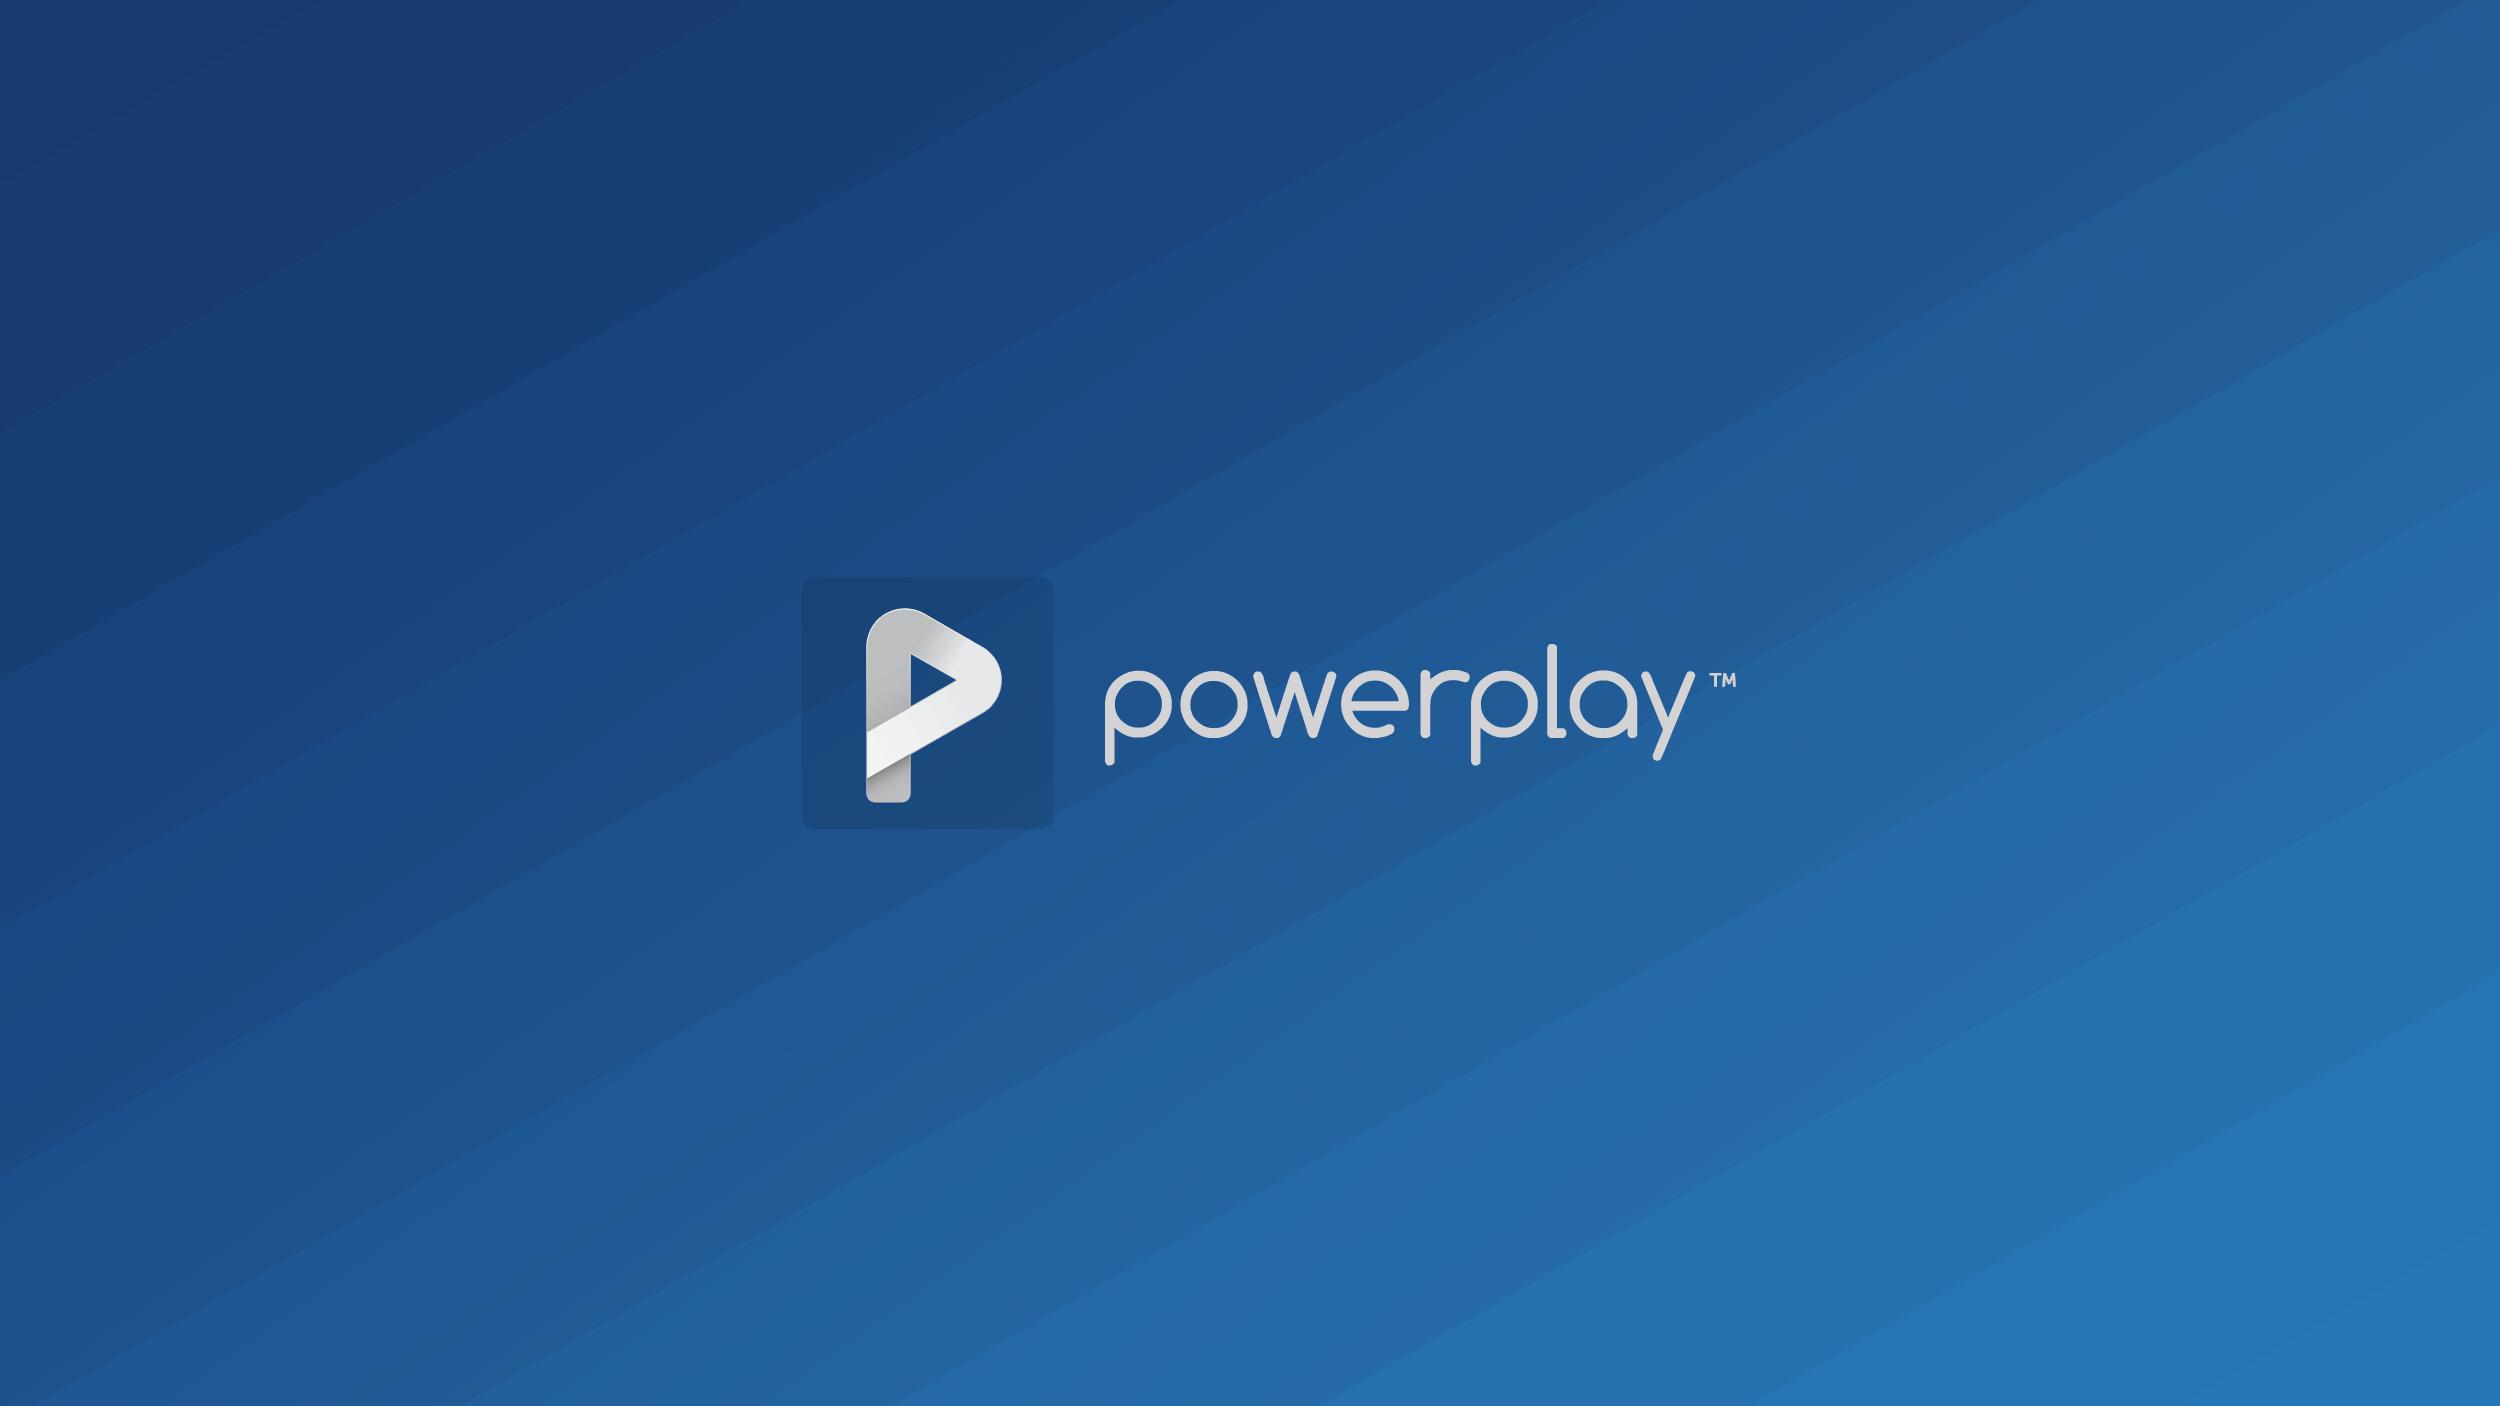 powerplay_appLogo-2-new.png